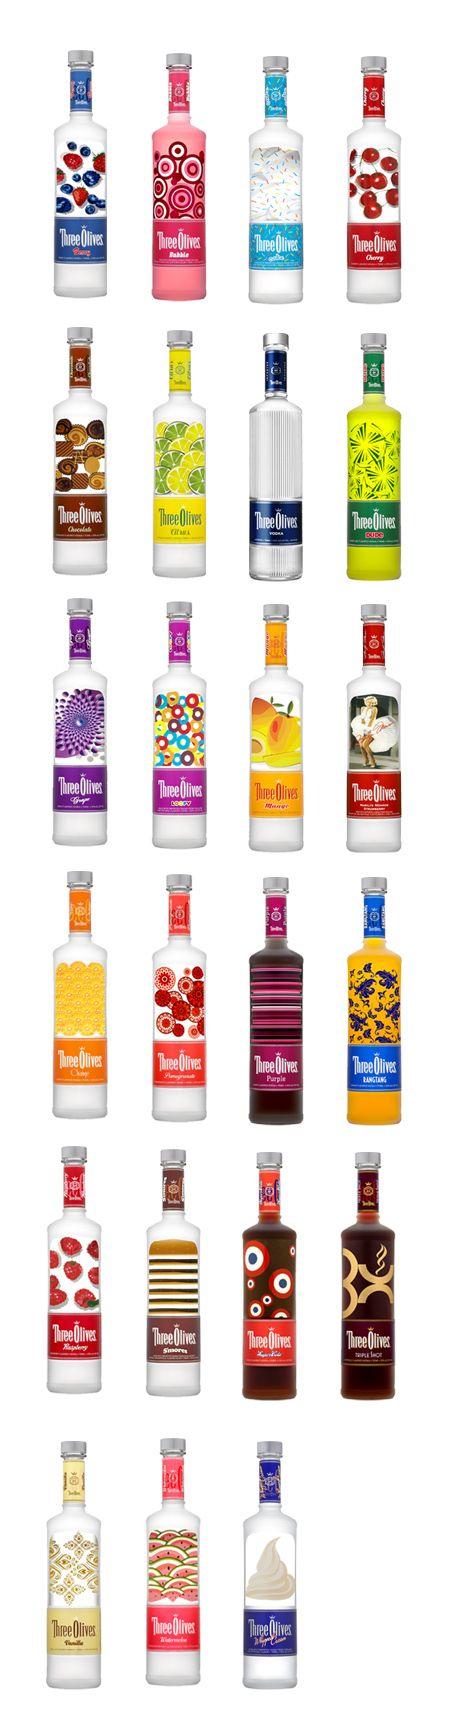 All of the Three Olive Vodka Bottle designs. I had no idea they had so many fun flavors.